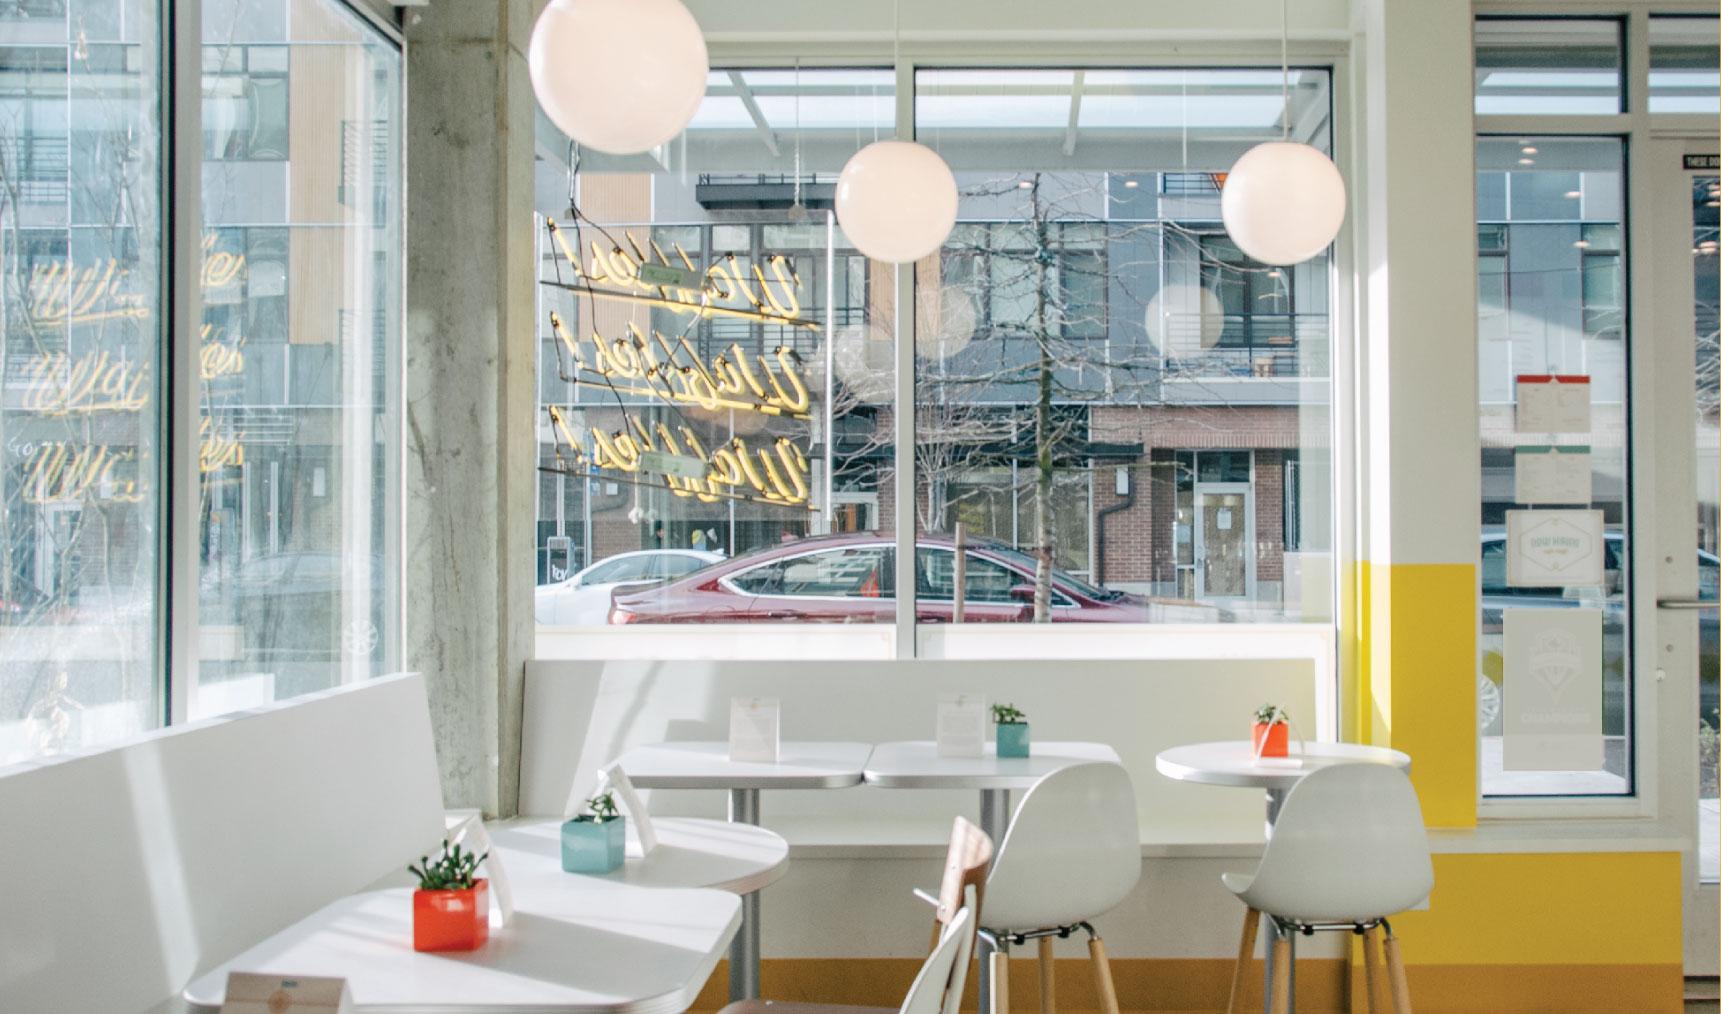 sweet-iron-waffles-seattle-restaurant-branding-ktom-creative-graphic-design-interiors.jpg